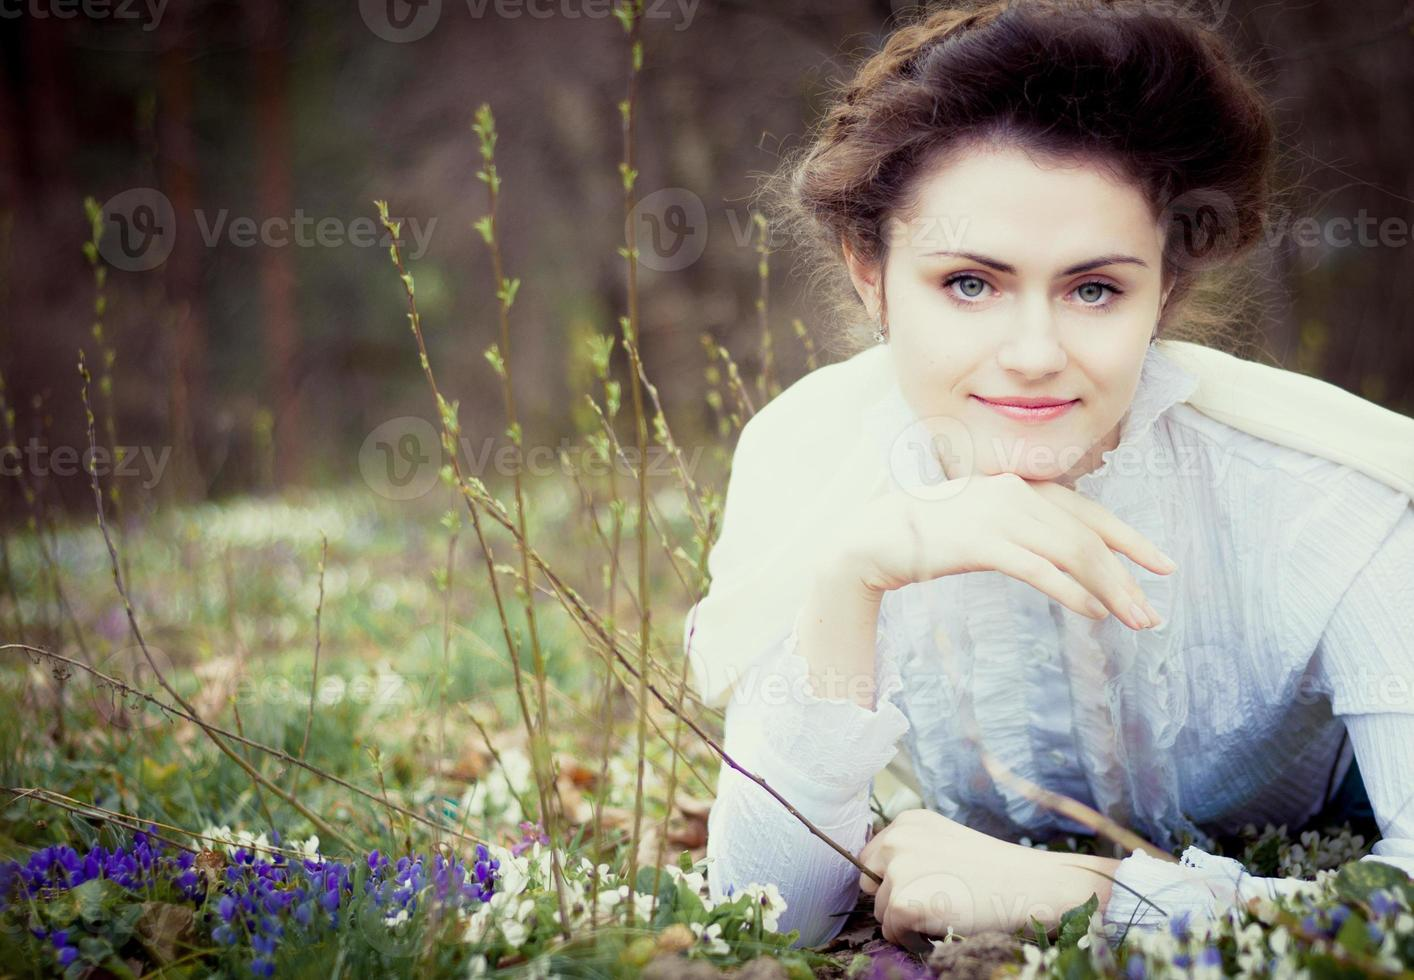 mulher caucasiana romântica em roupa vintage. Estilo retrô foto